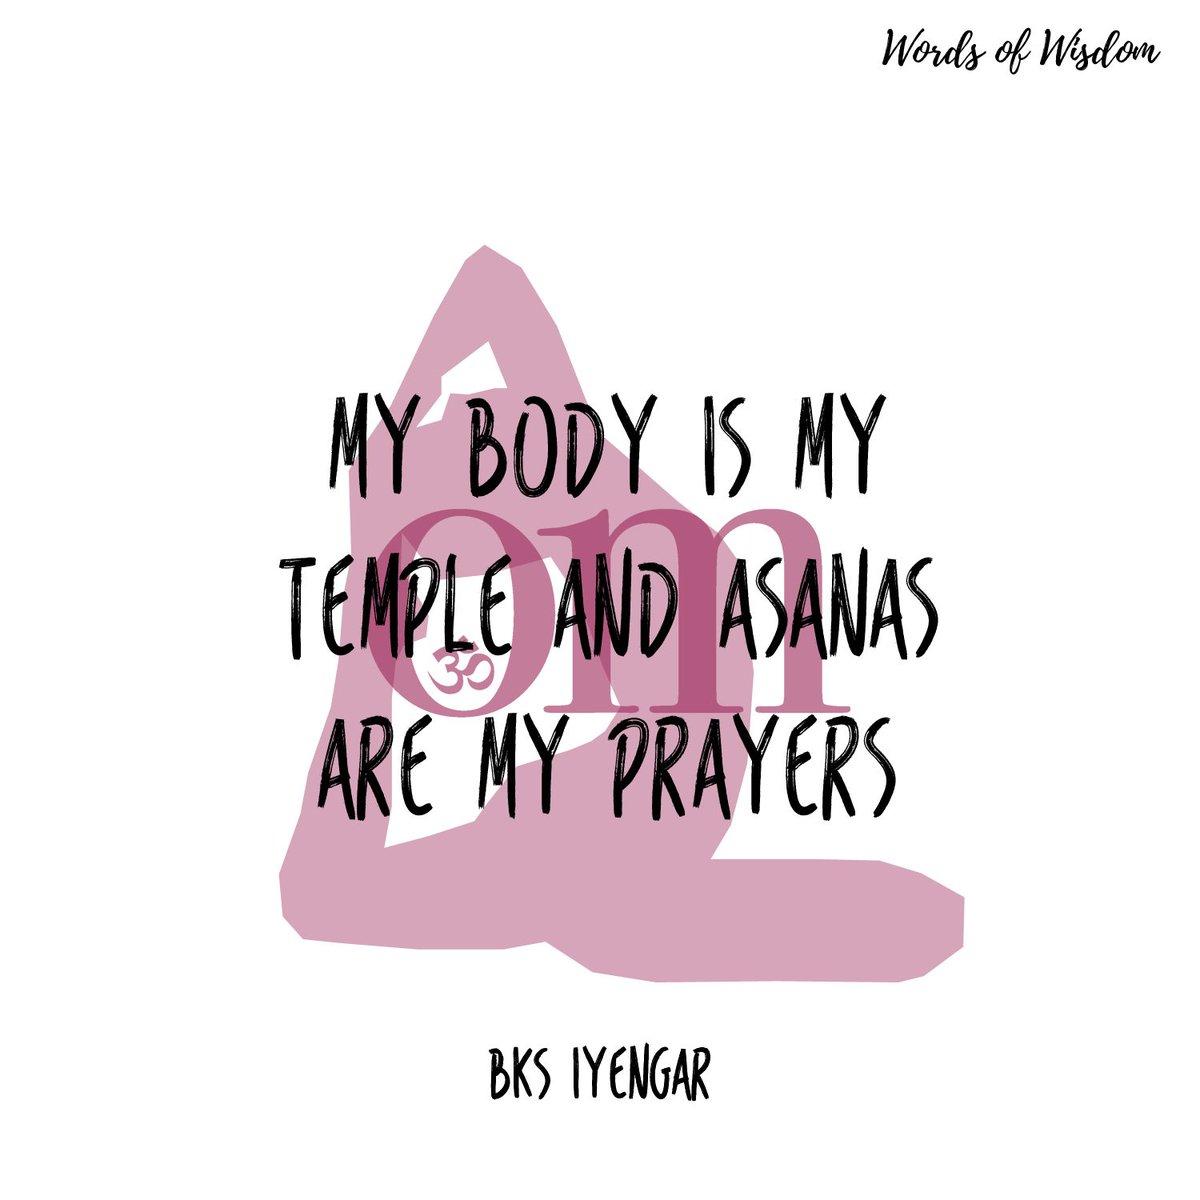 This month's Words of Wisdom come from BKS Iyengar. #omyogamagazine #wordsofwisdom #bksiyengar